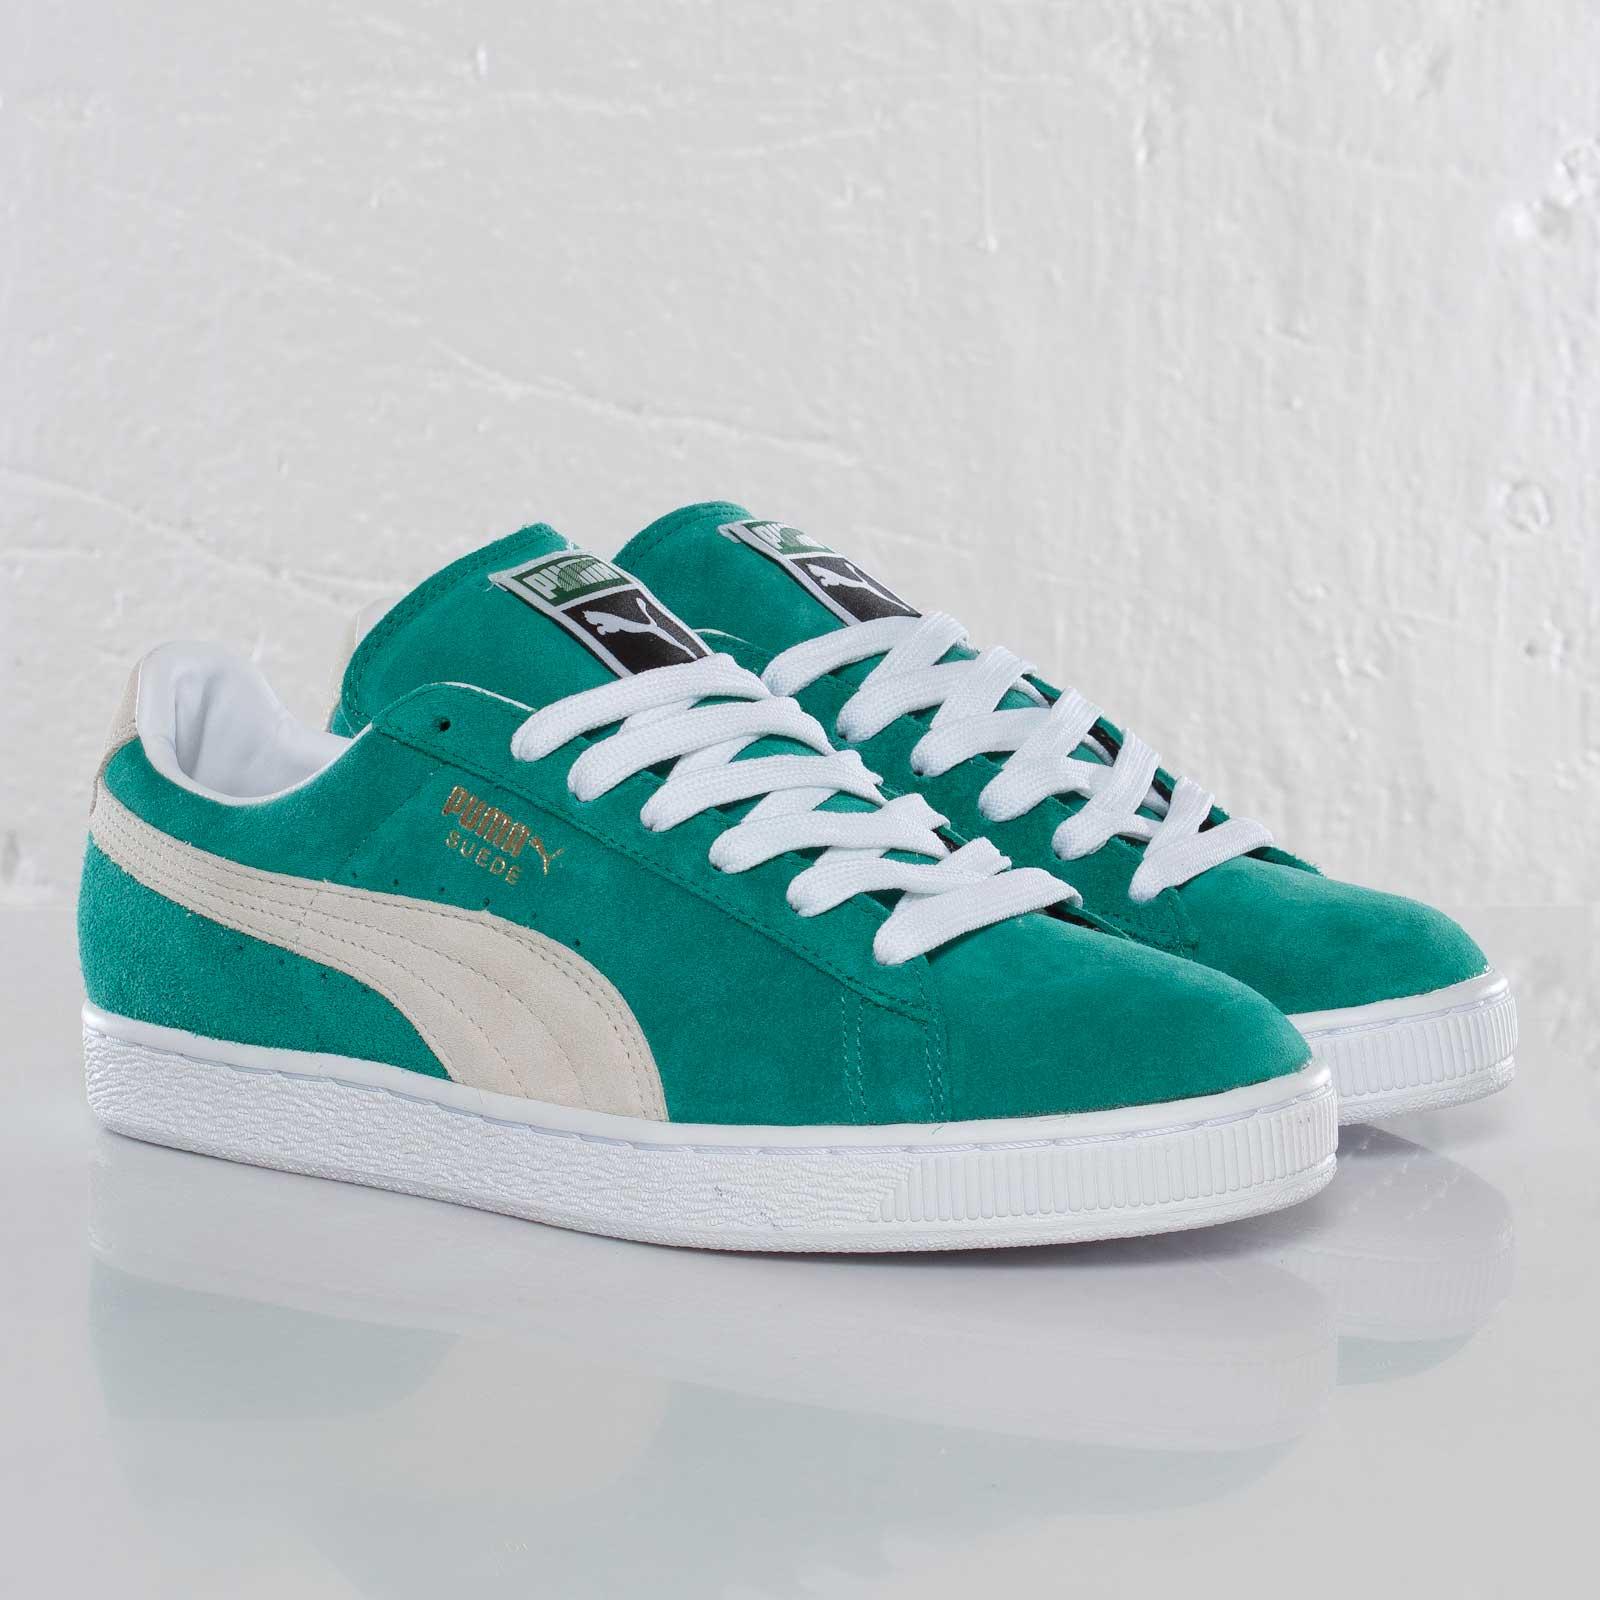 85fd2b265d9 Puma Suede Classic ECO - 352634-57 - Sneakersnstuff | sneakers ...